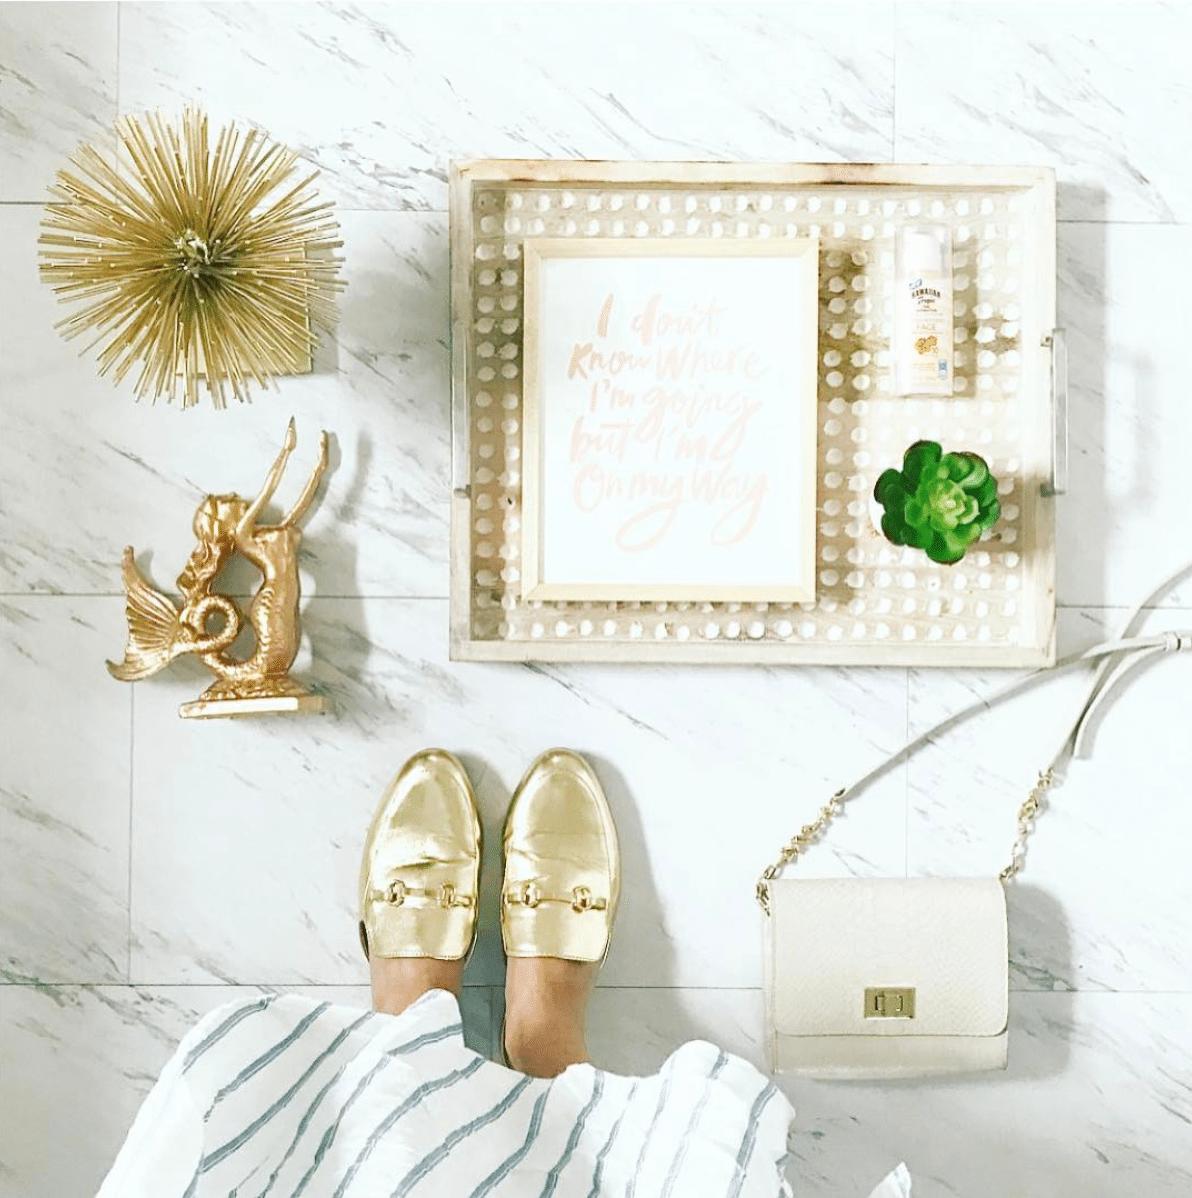 Shop my instagram | Mash Elle beauty blogger | fashion inspo | Shop my closet | instagram style | crossbody bag